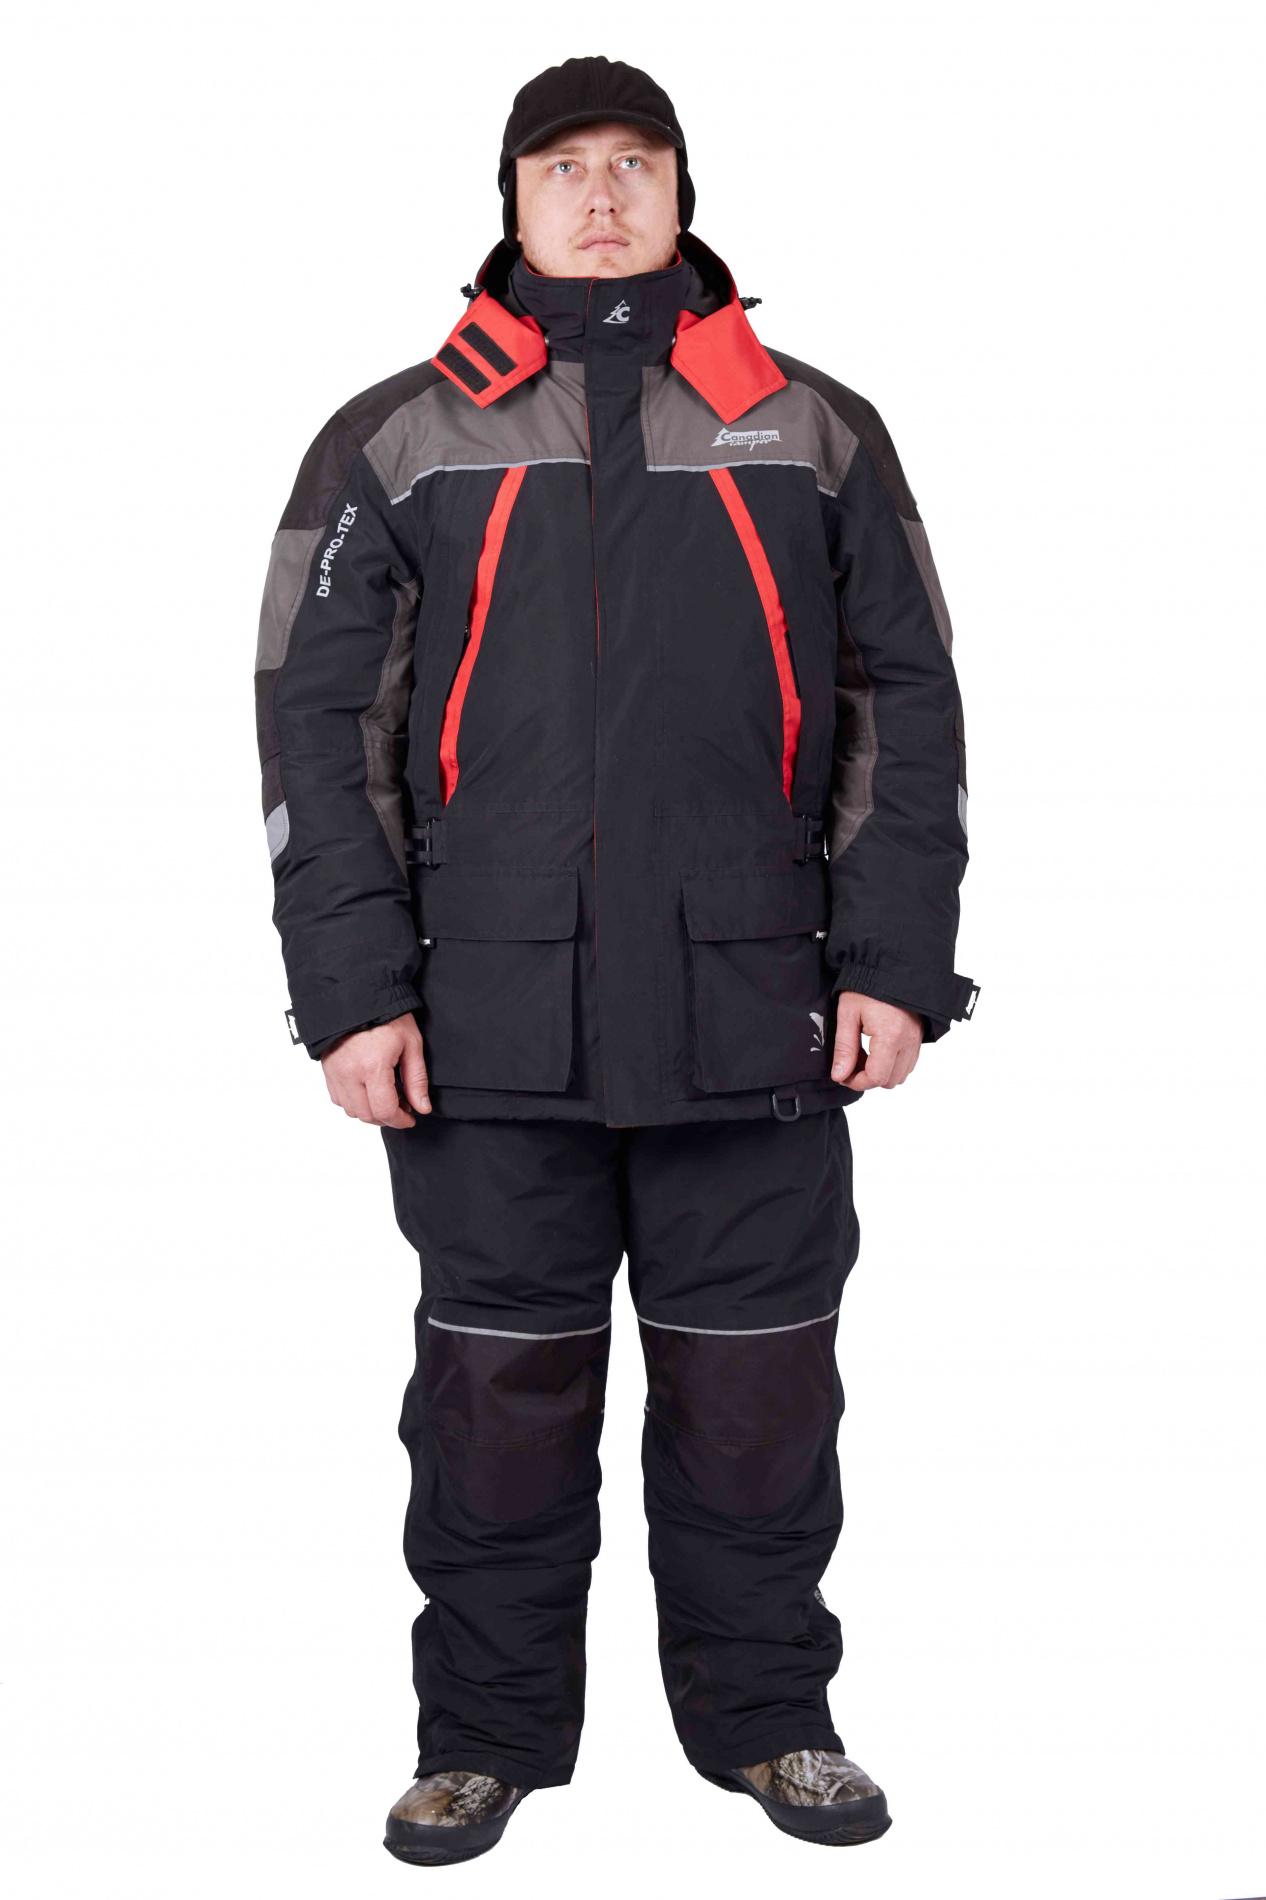 Костюм универсальный зимний VIKING (куртка+брюки)  (BLACK/GREY, XXL)